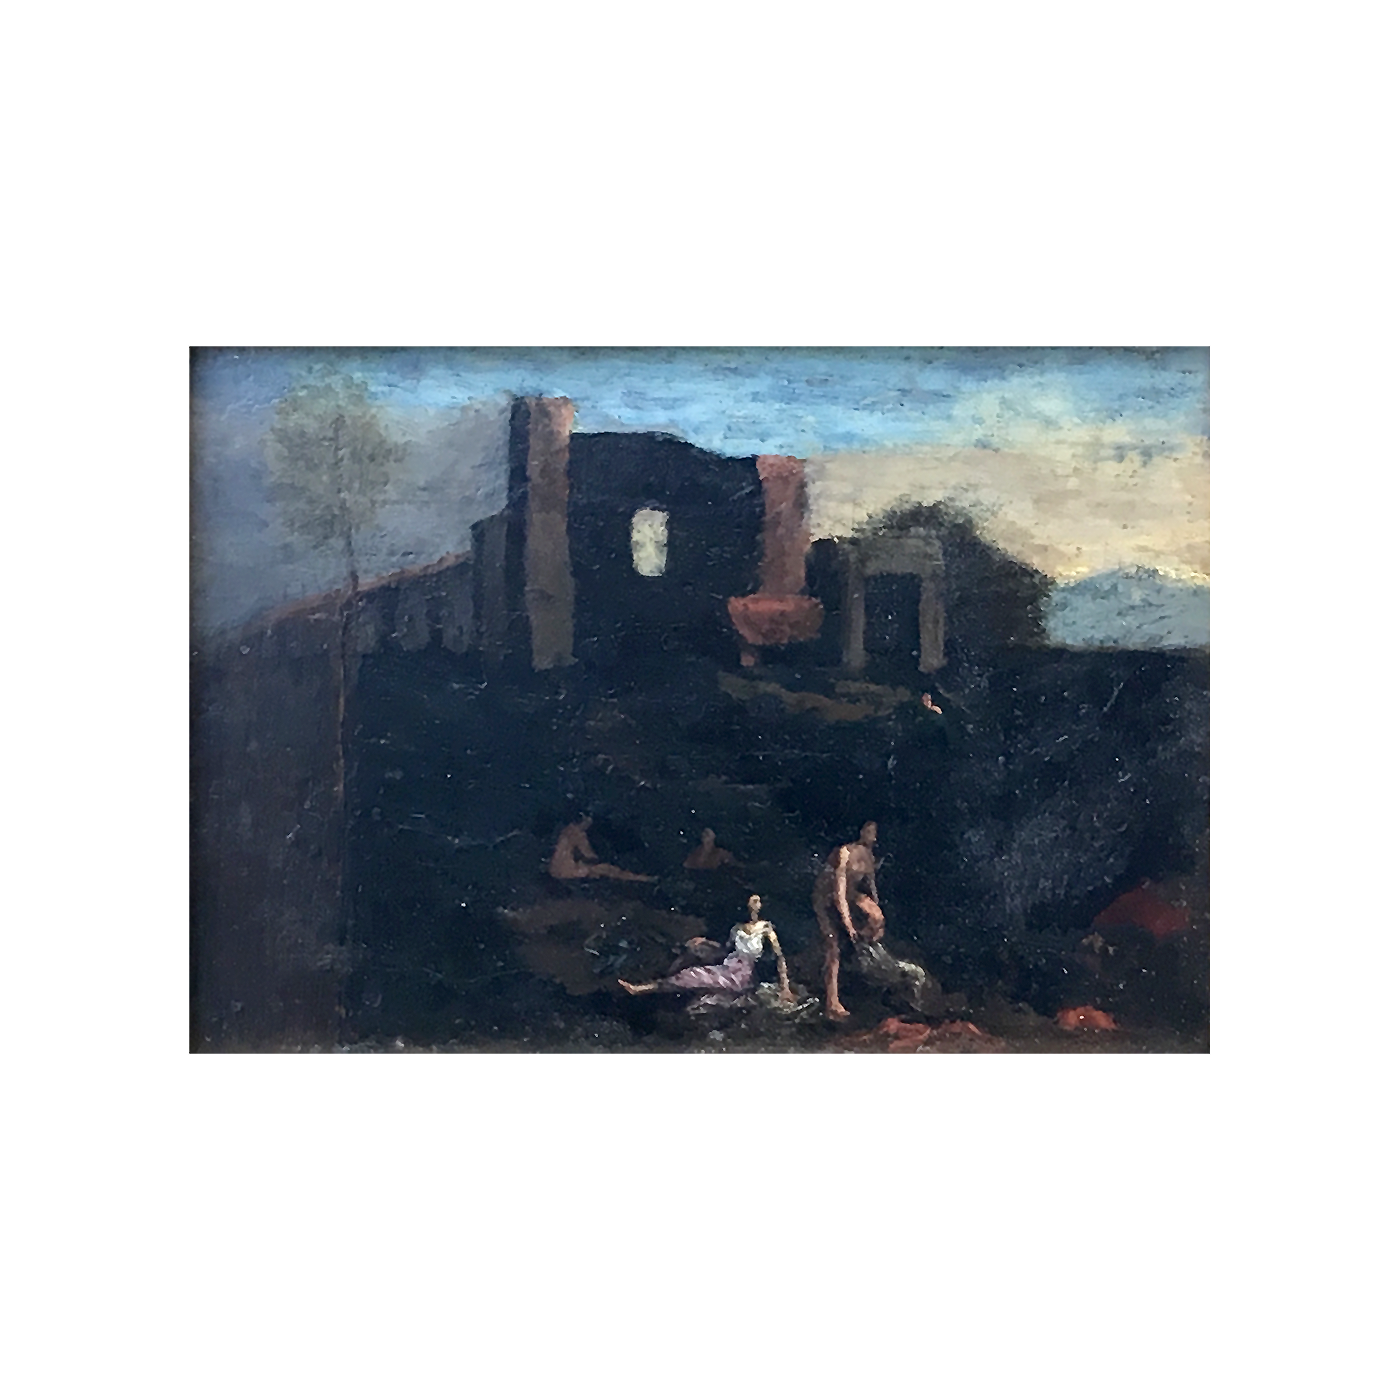 Cornelis Van Poelenburgh [1586-1667] : Nudes at the ruins, ca.1660s.